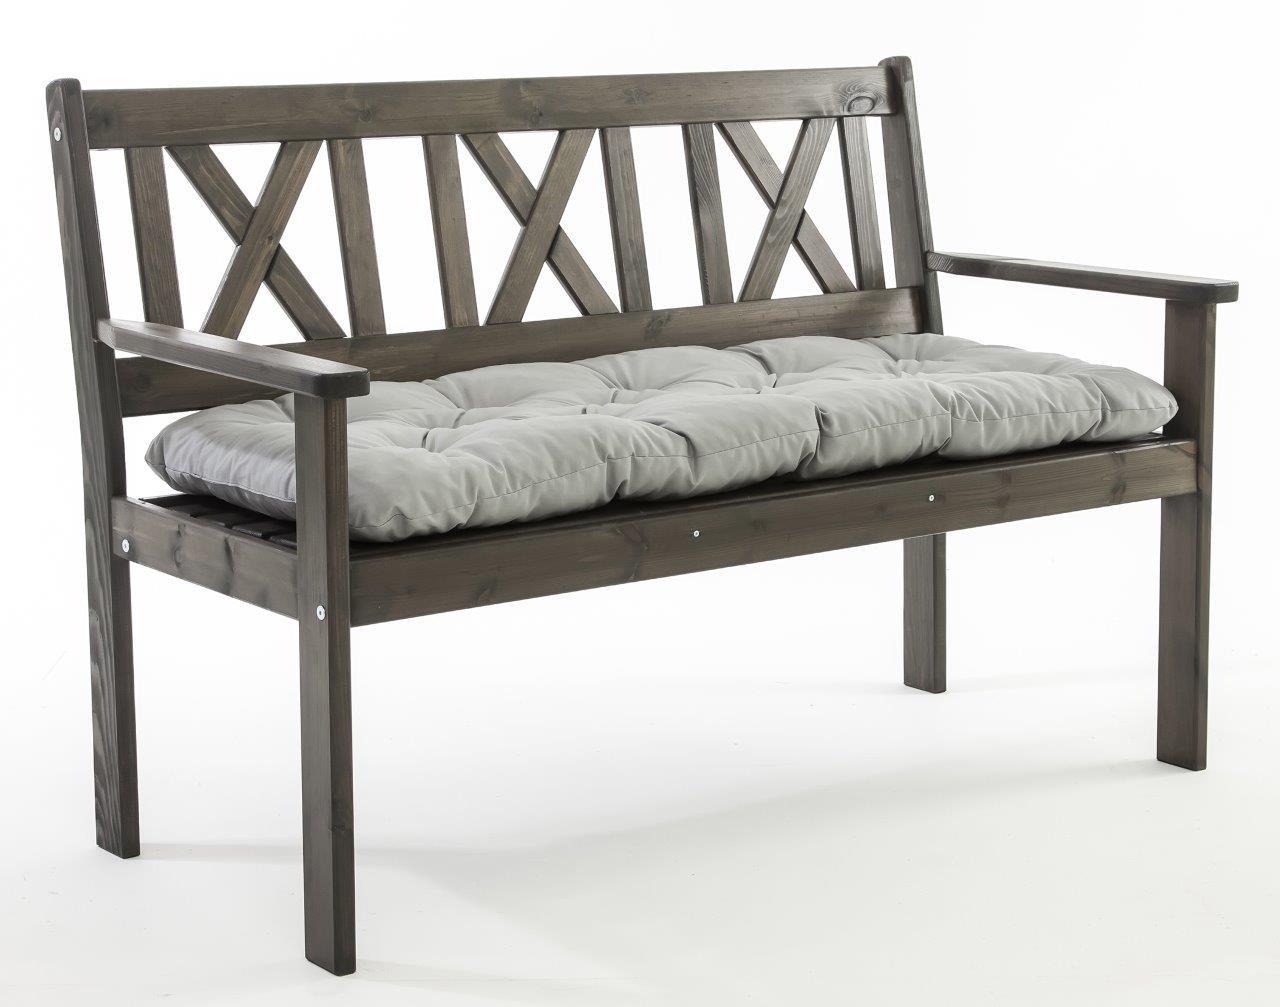 auflage f r sessel stuhl stuhlauflage mit r ckenteil. Black Bedroom Furniture Sets. Home Design Ideas